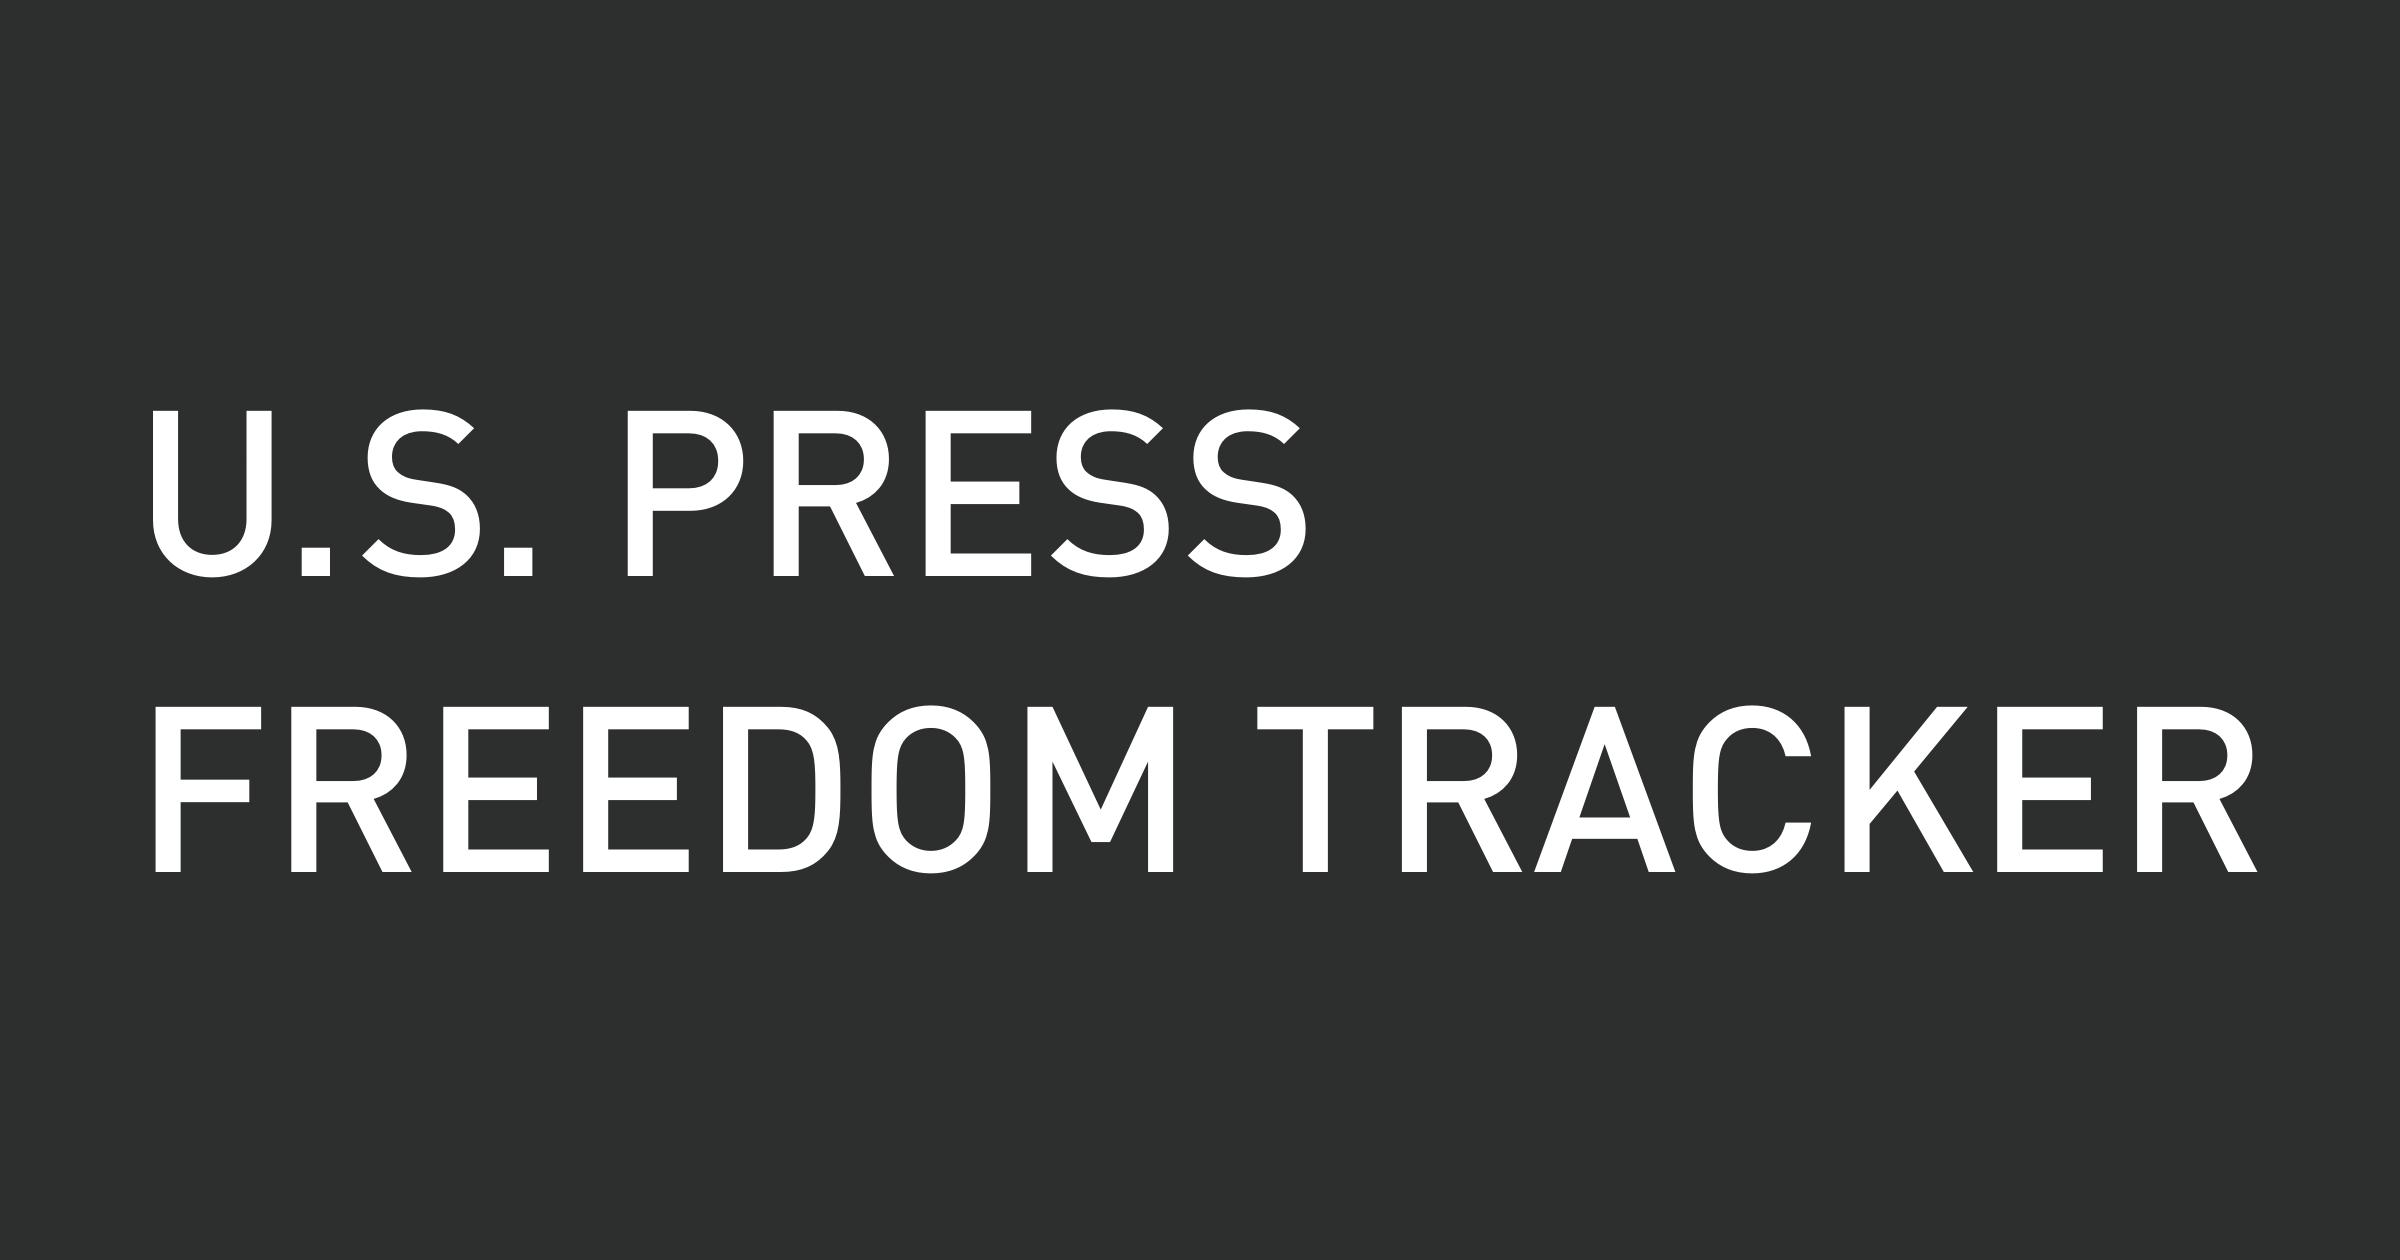 pressfreedomtracker.us